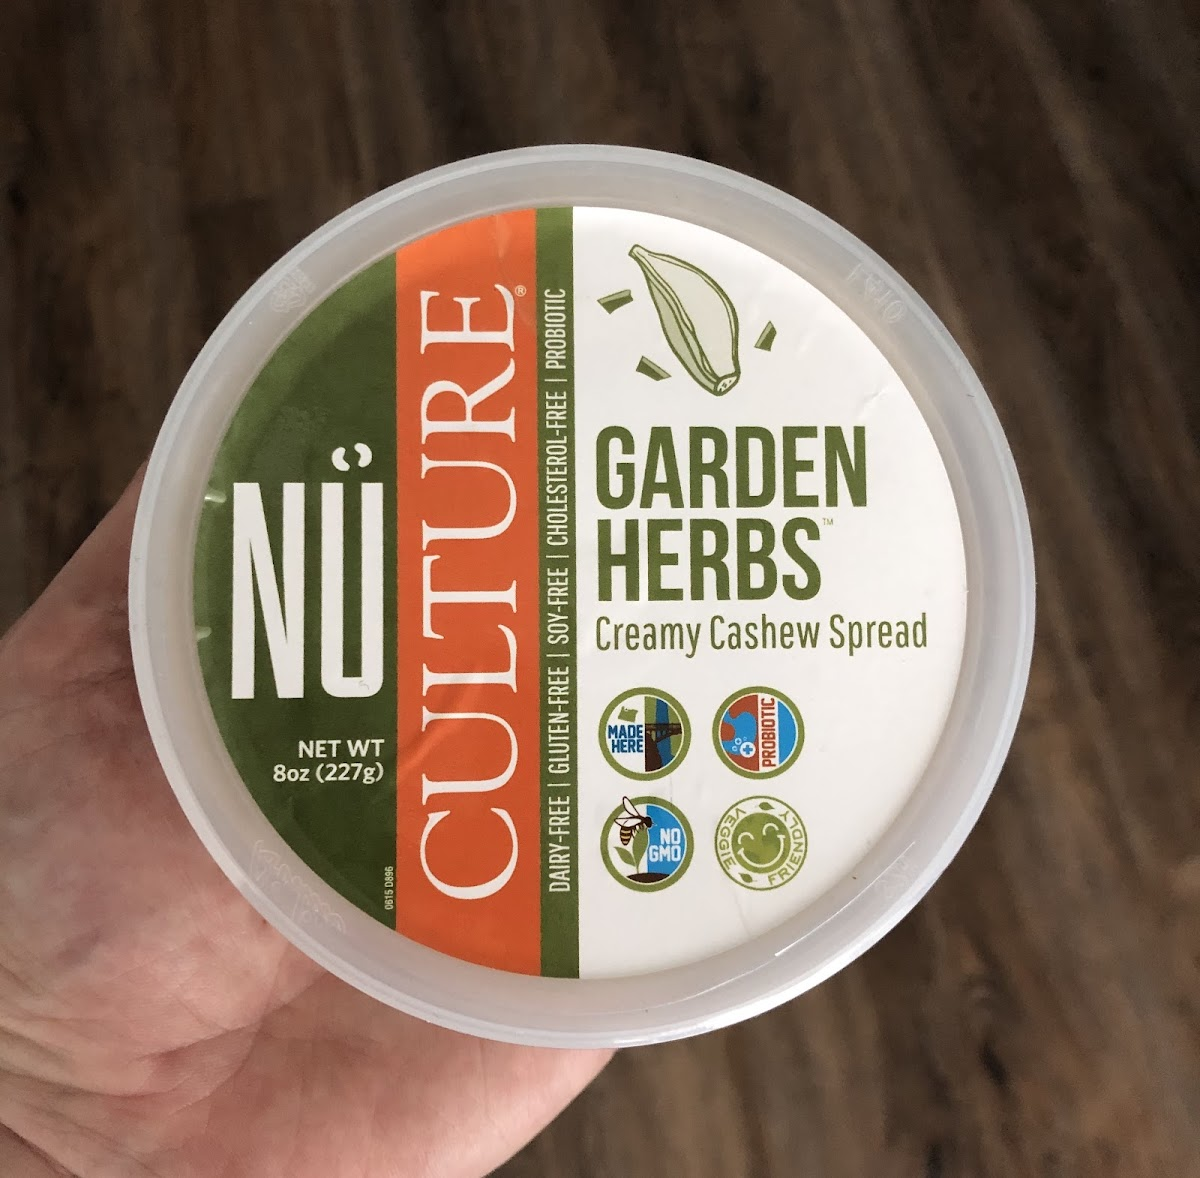 Garden Herbs Creamy Cashew Spread